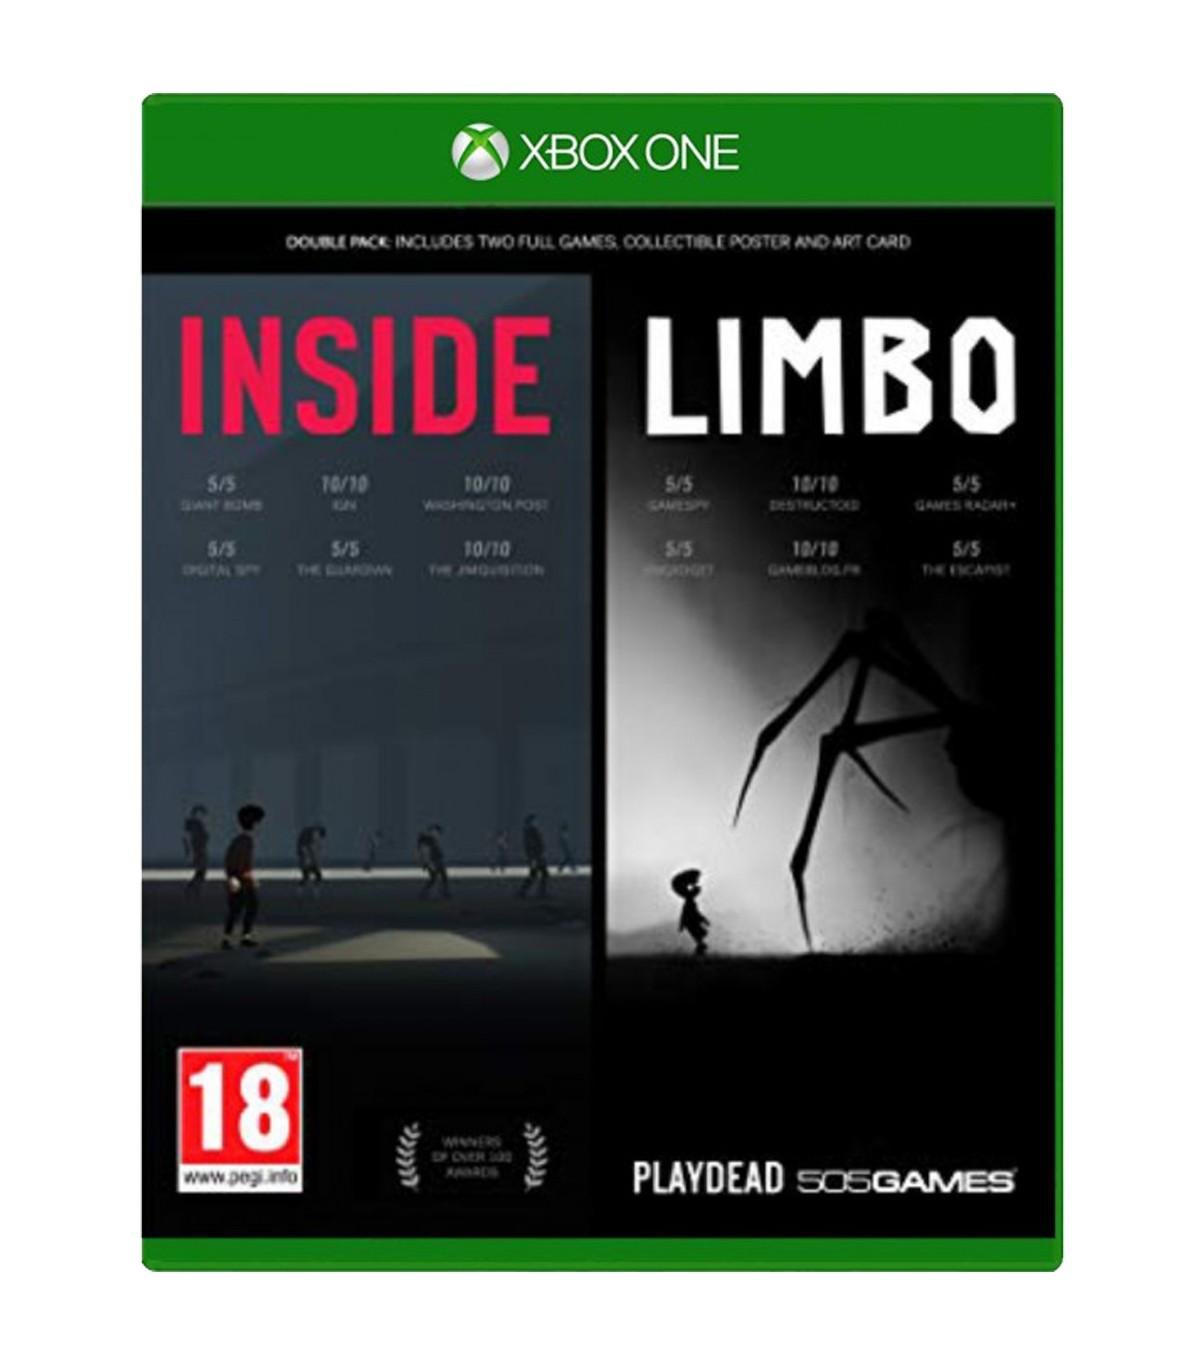 بازی INSIDE / LIMBO Double Pack - ایکس باکس وان